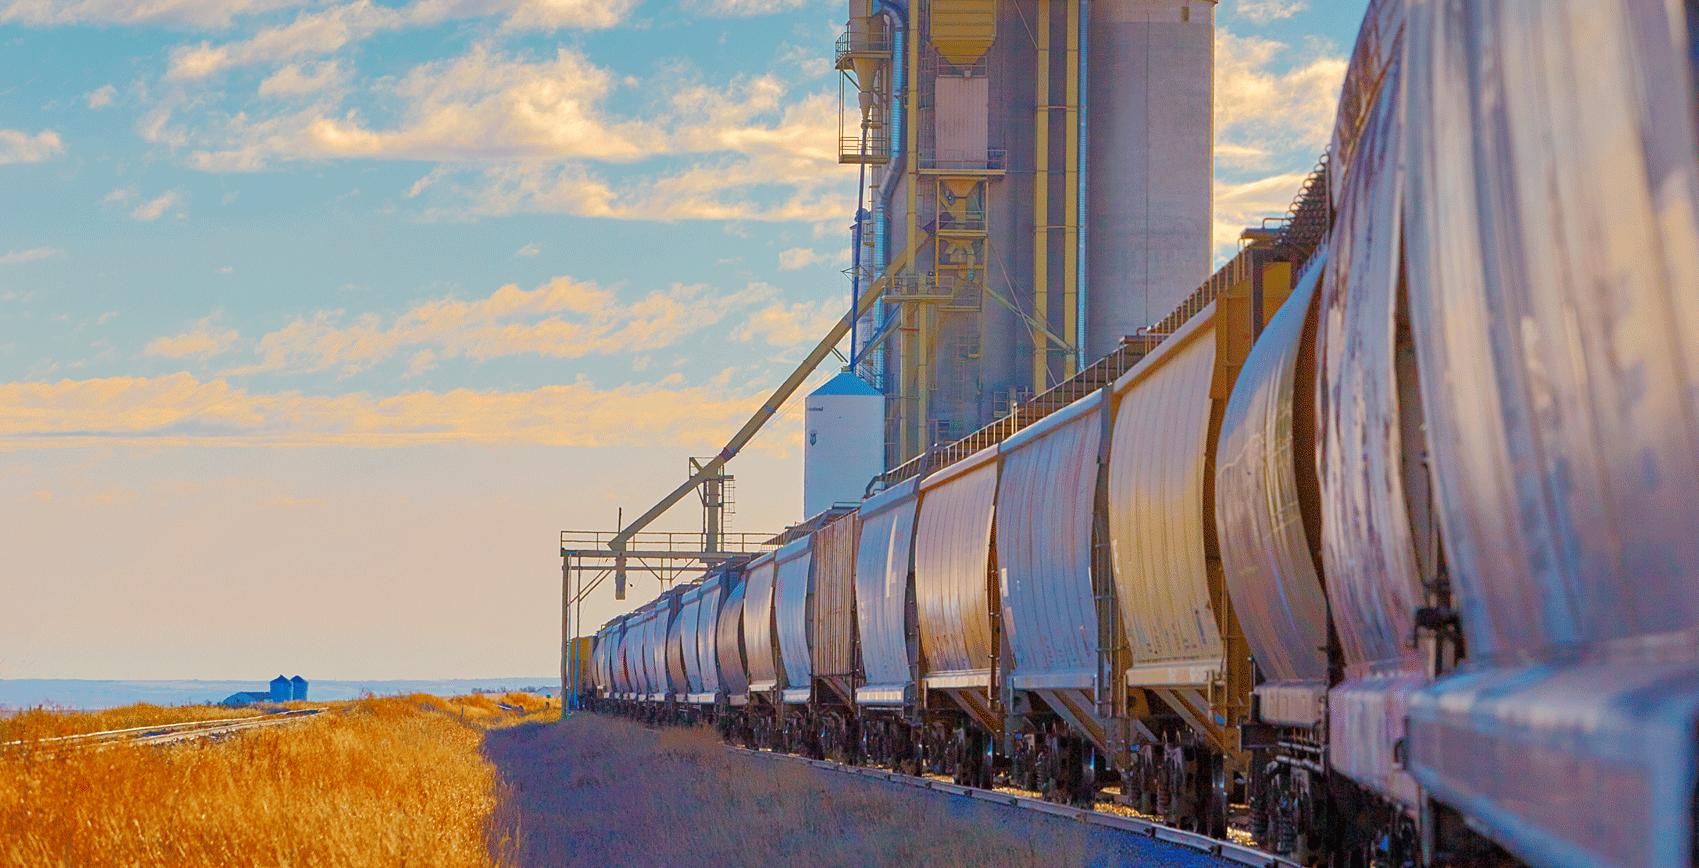 Train running alongside a field and a grain elevator..